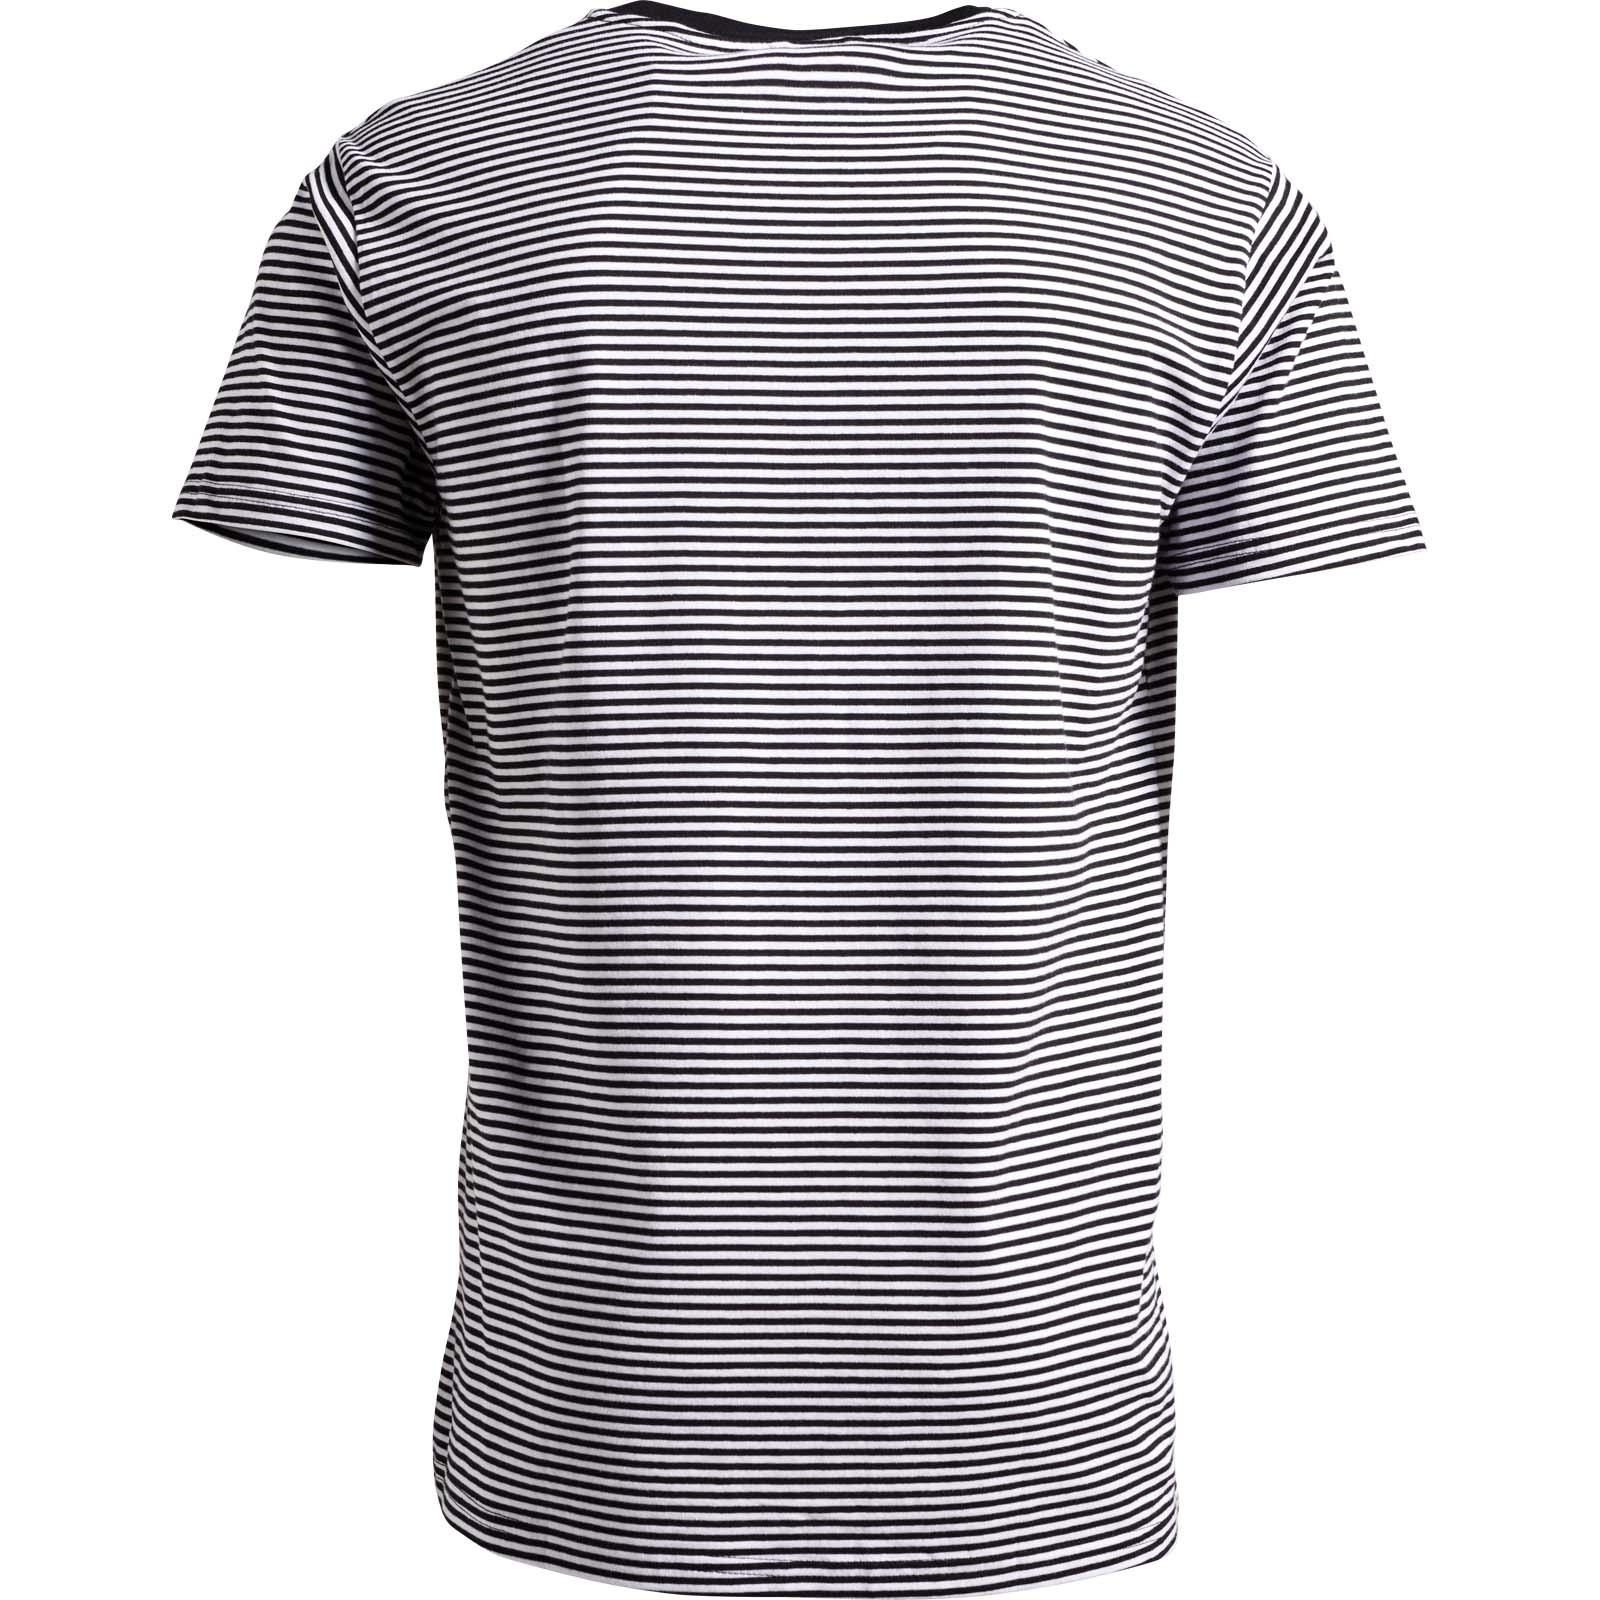 Mads Nørgaard mini Thor t-shirt, black/white, large